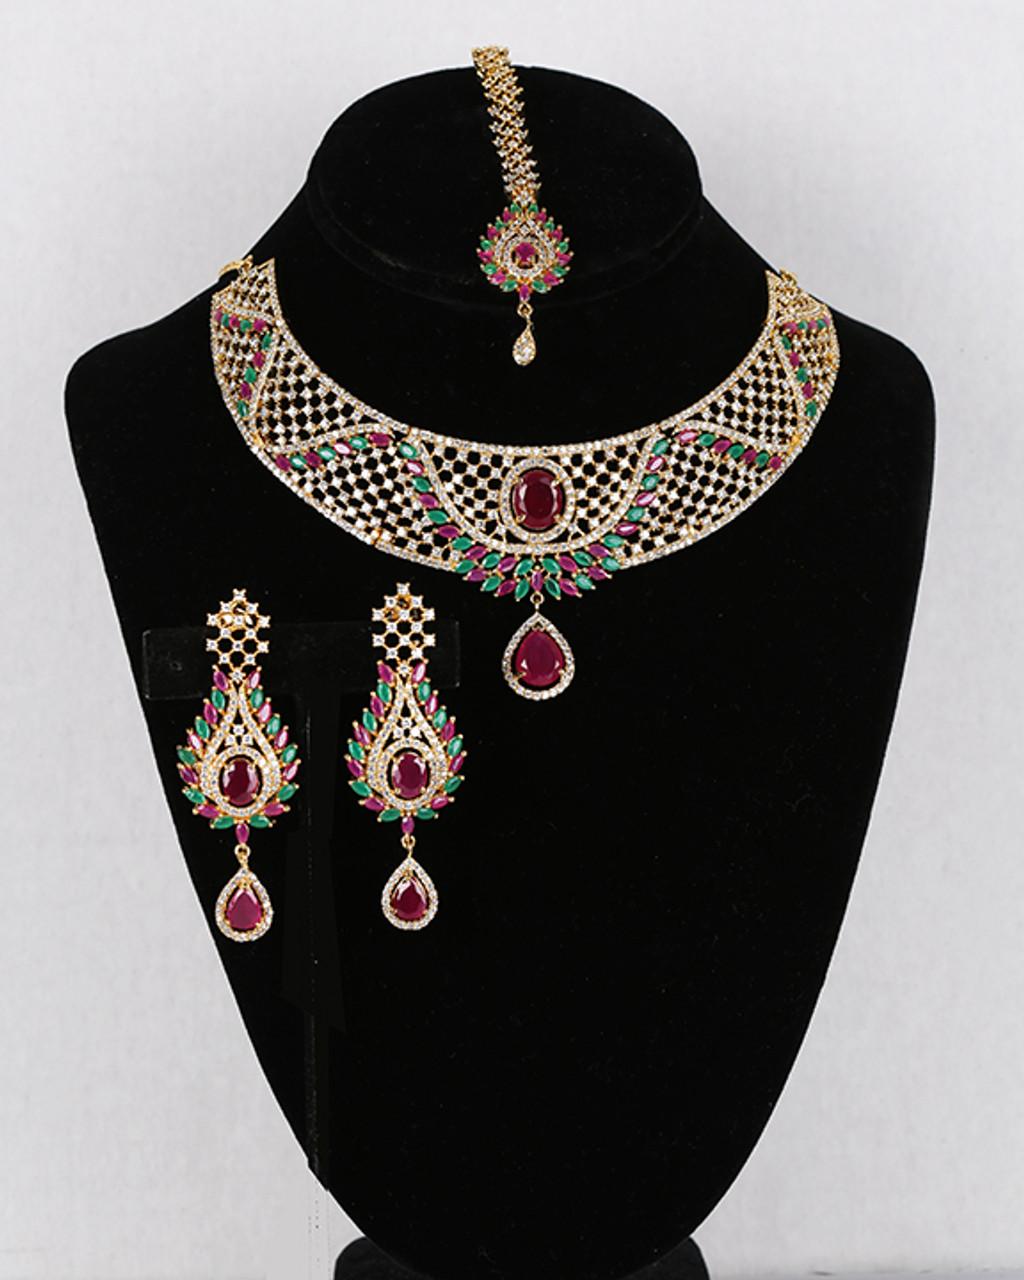 Imitation jewelry CZ ruby and emerald necklace set Indian bridal jewelry Artificial jewelry